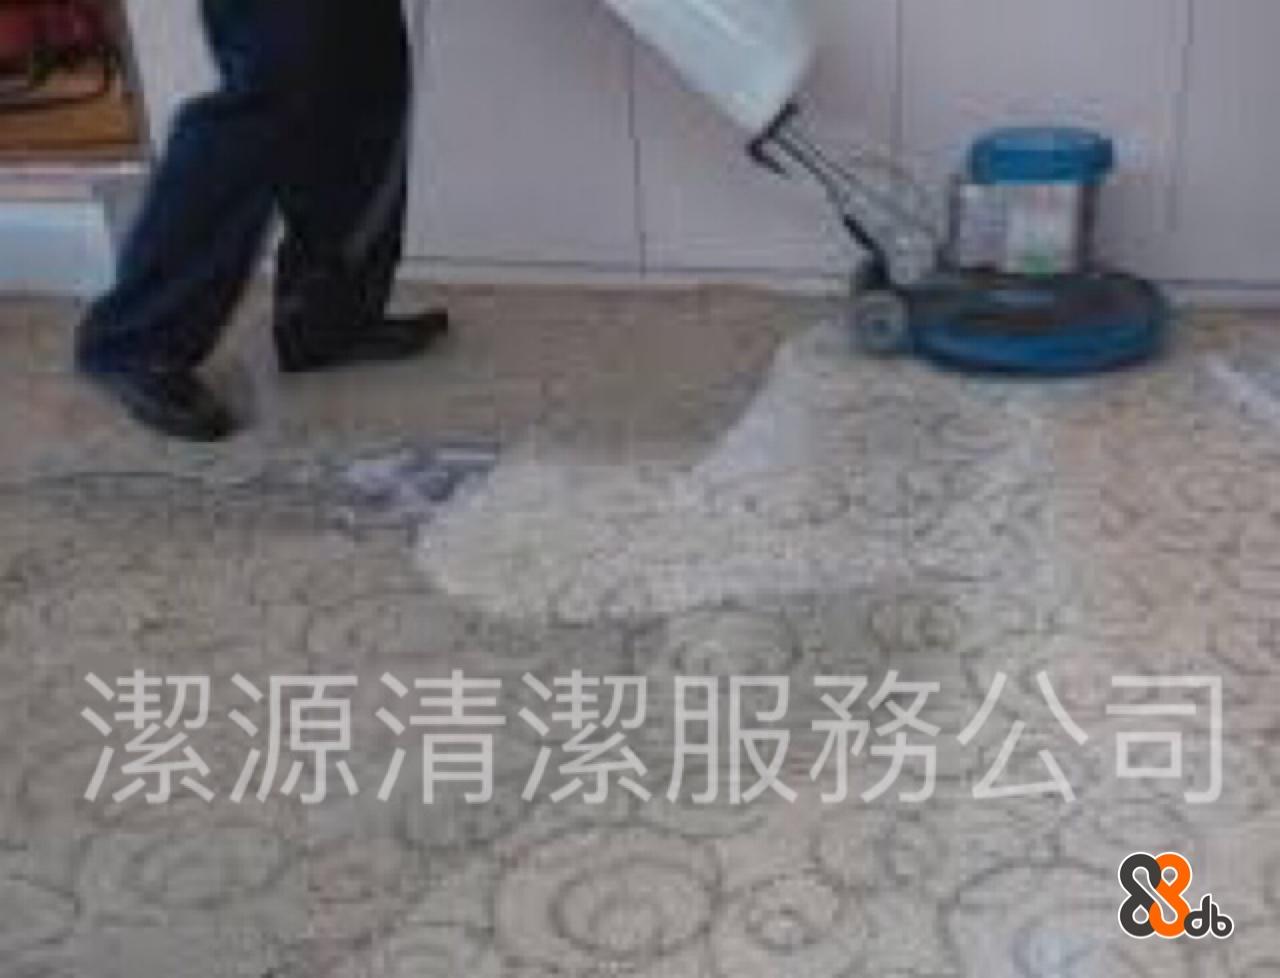 潔源清潔服務公司 db  Floor,Flooring,Tile,Concrete,